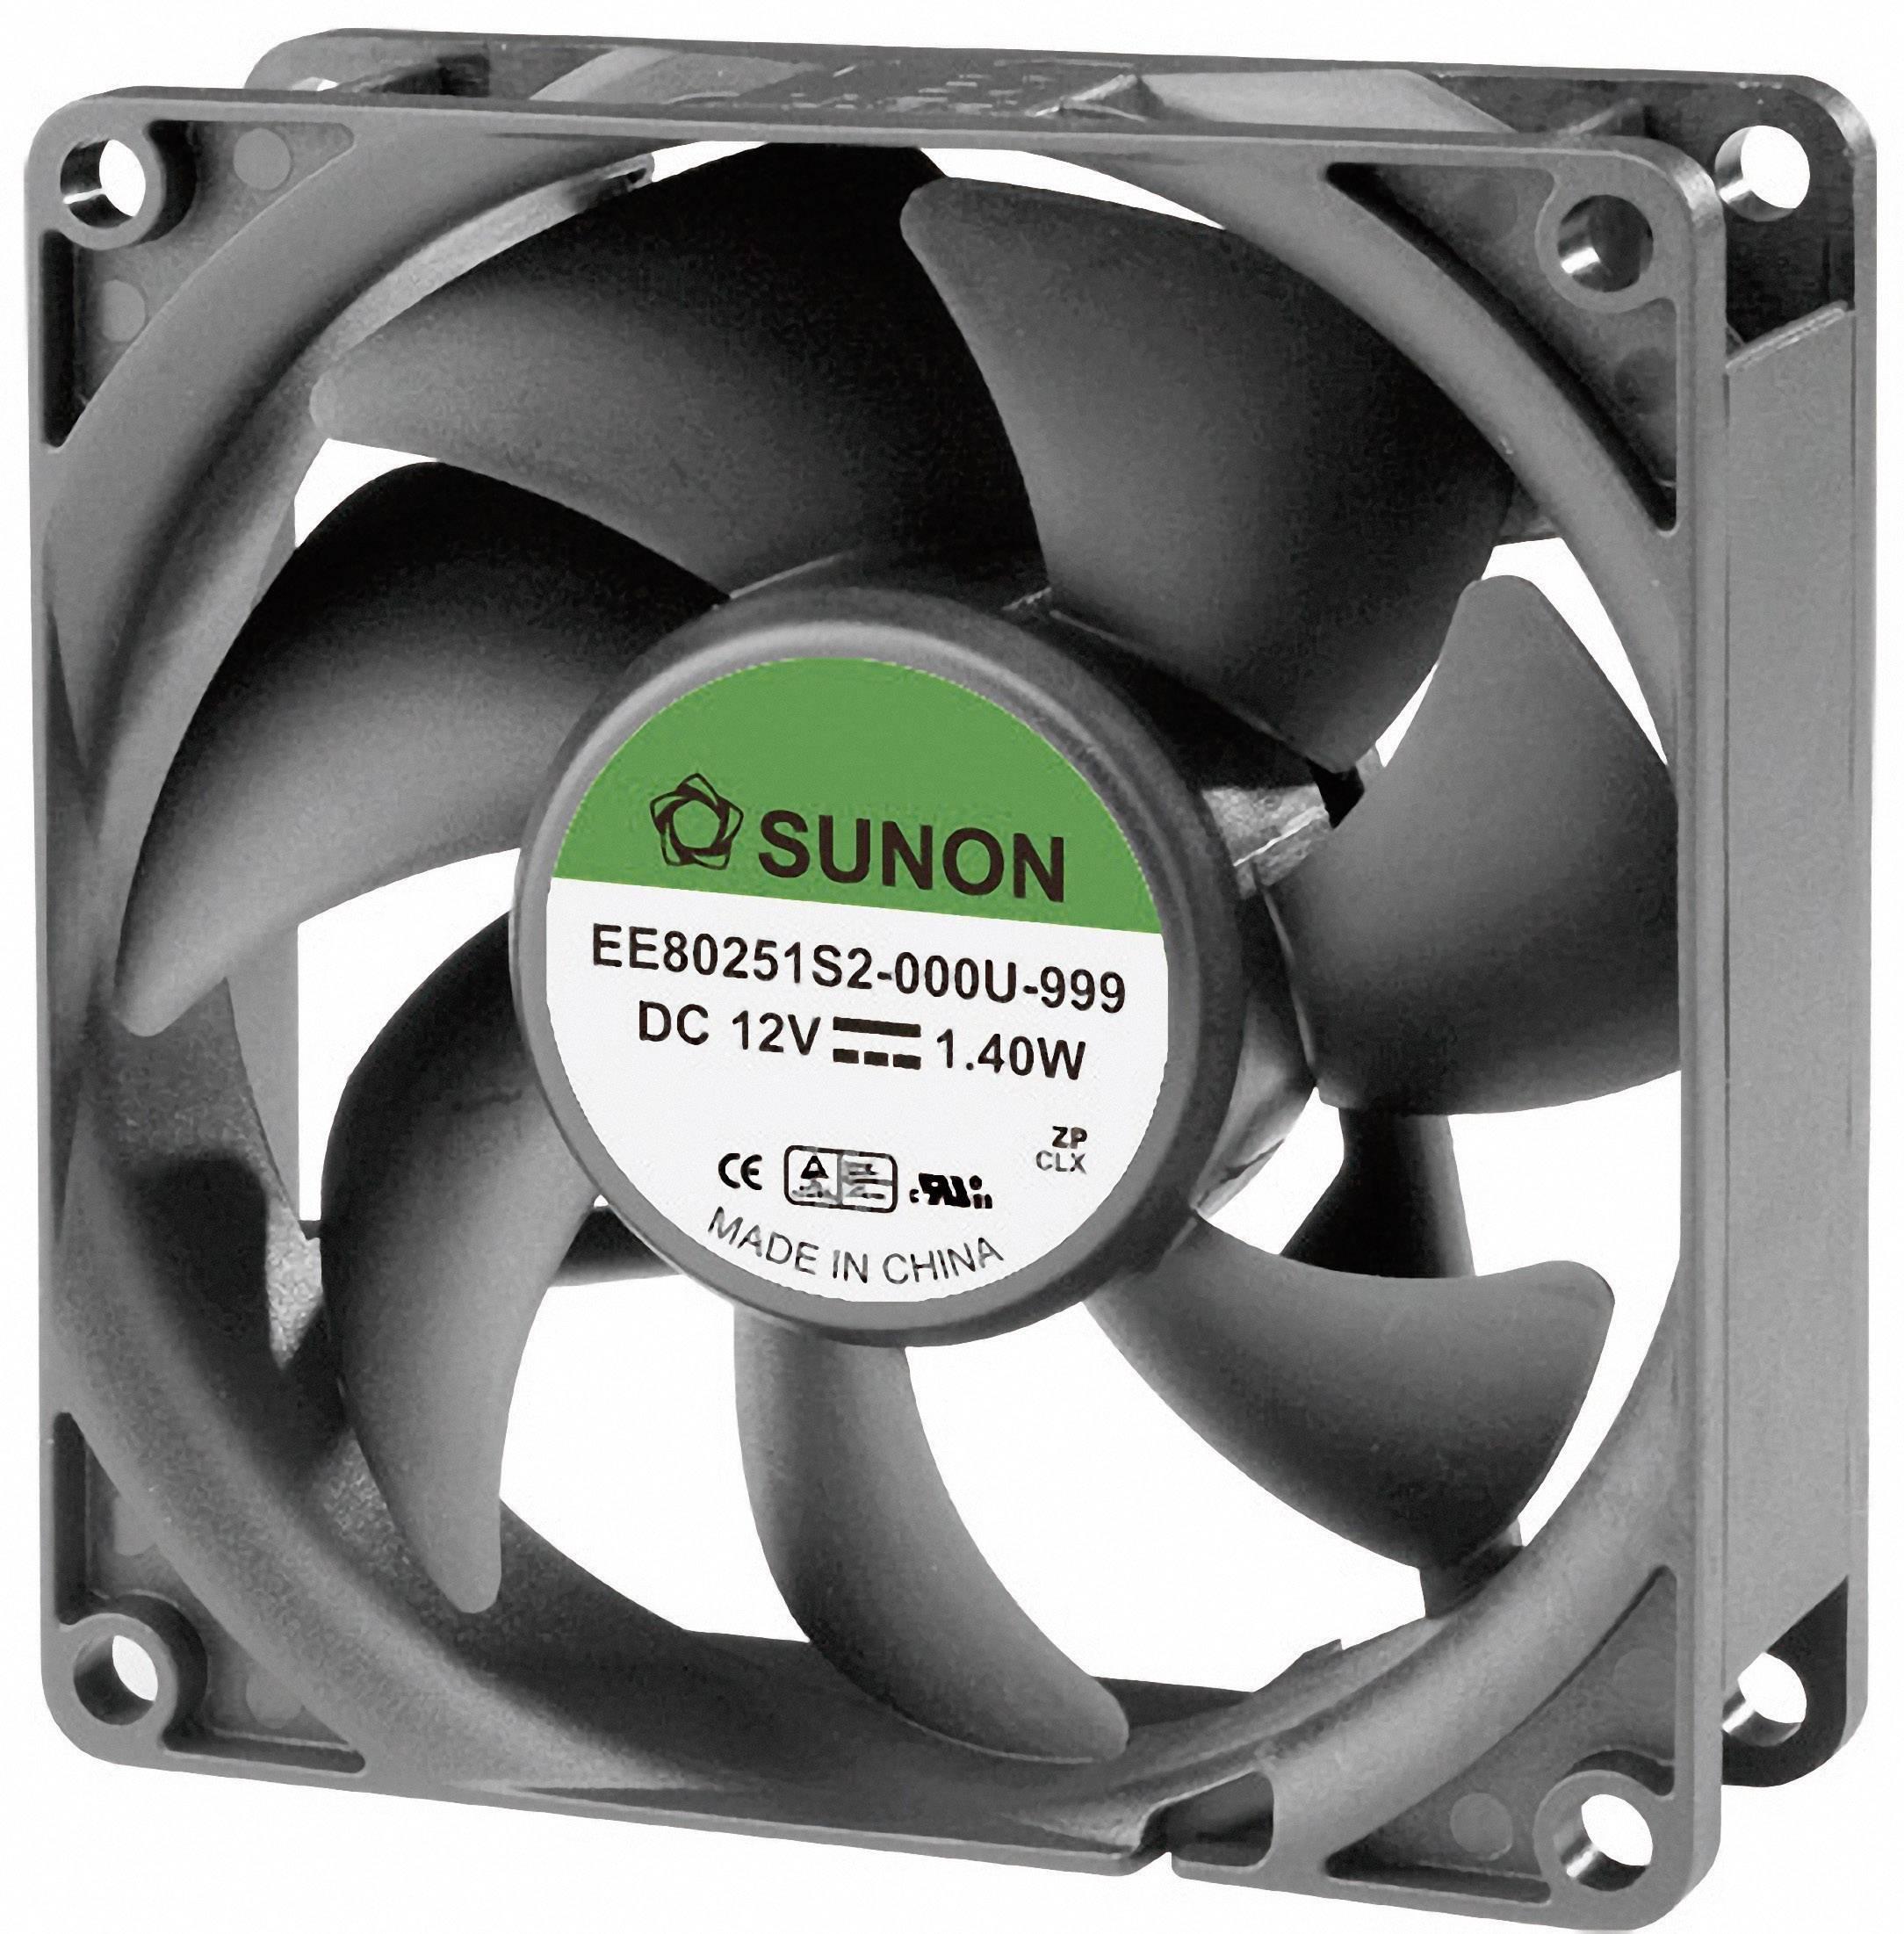 Axiálny ventilátor Sunon EE80251S2-0000-999 EE80251S2-0000-999, 12 V/DC, 30 dB, (d x š x v) 80 x 80 x 25 mm